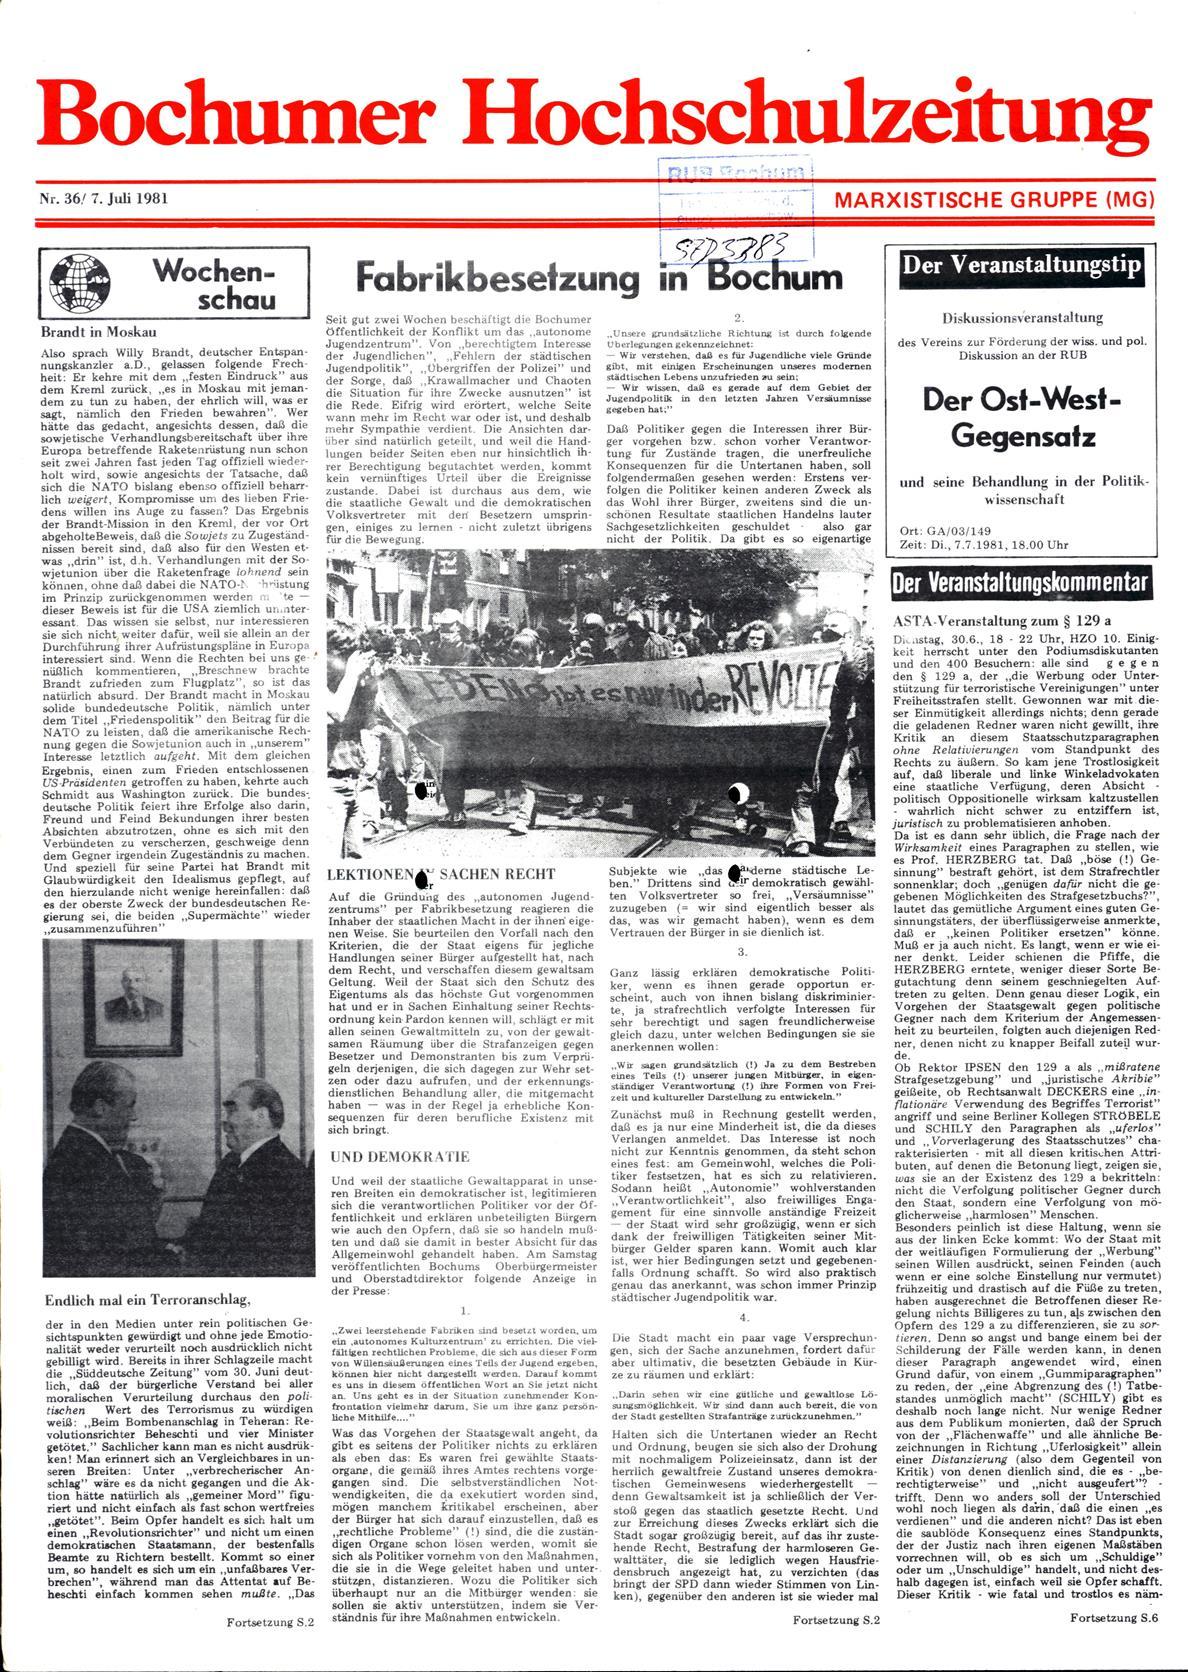 Bochum_BHZ_19810707_036_001